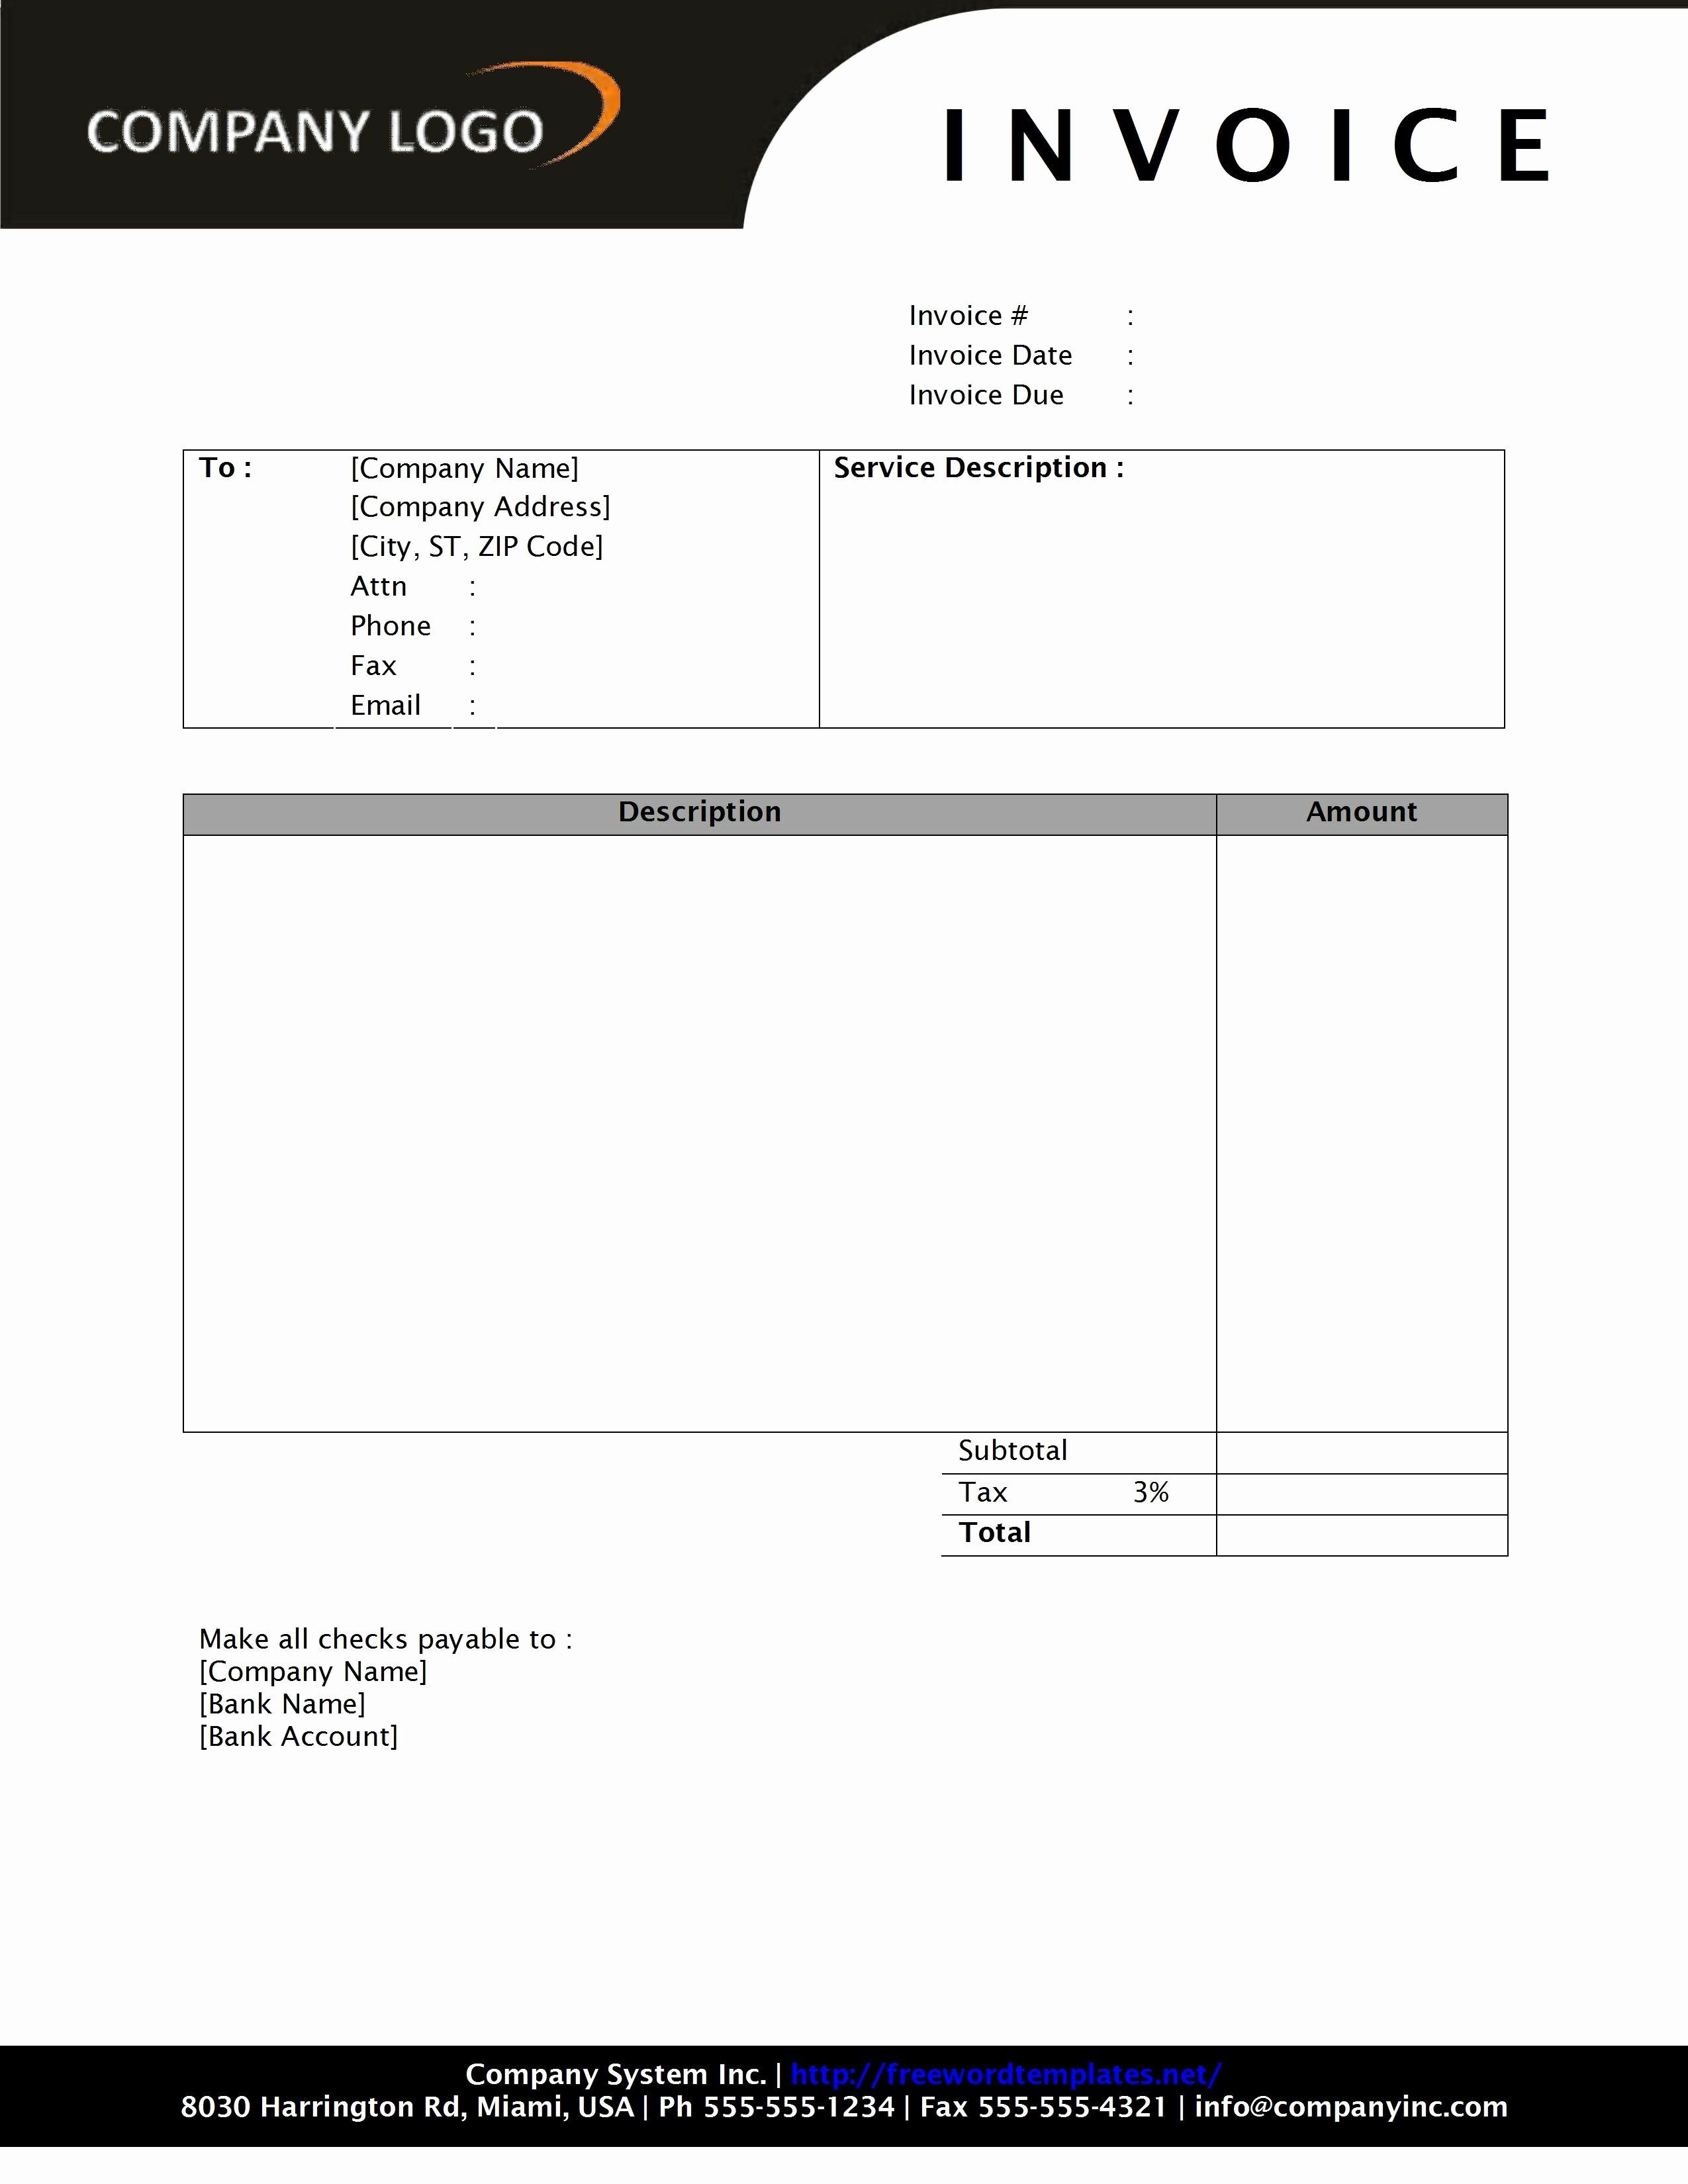 Invoice Template for Microsoft Word Unique Invoice Template Word 2010